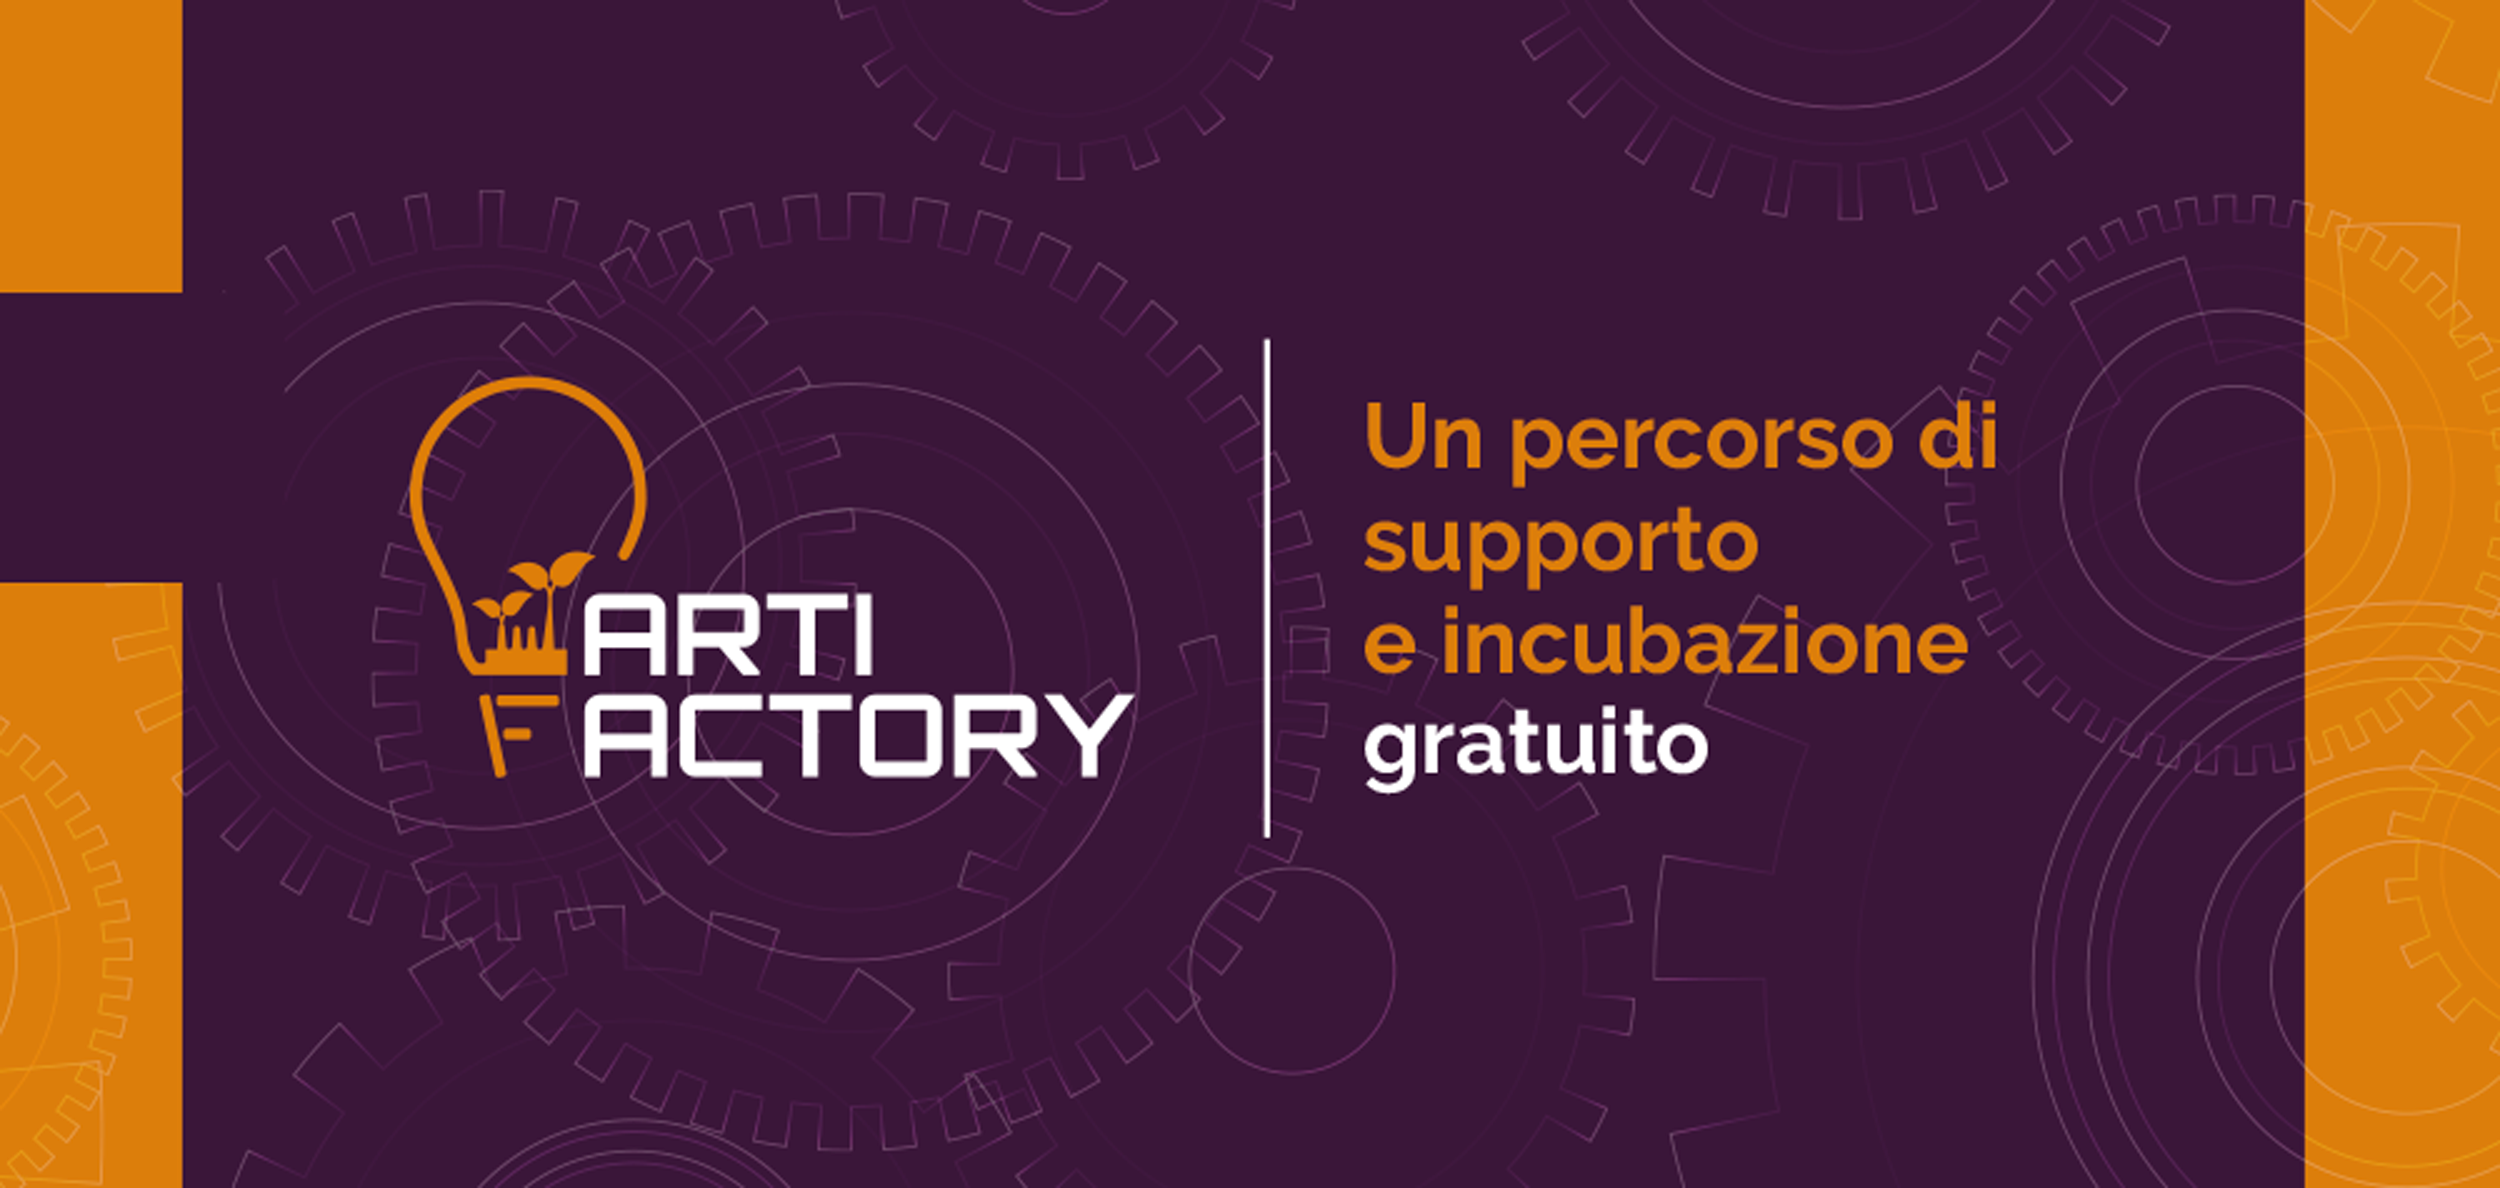 Arti Factory